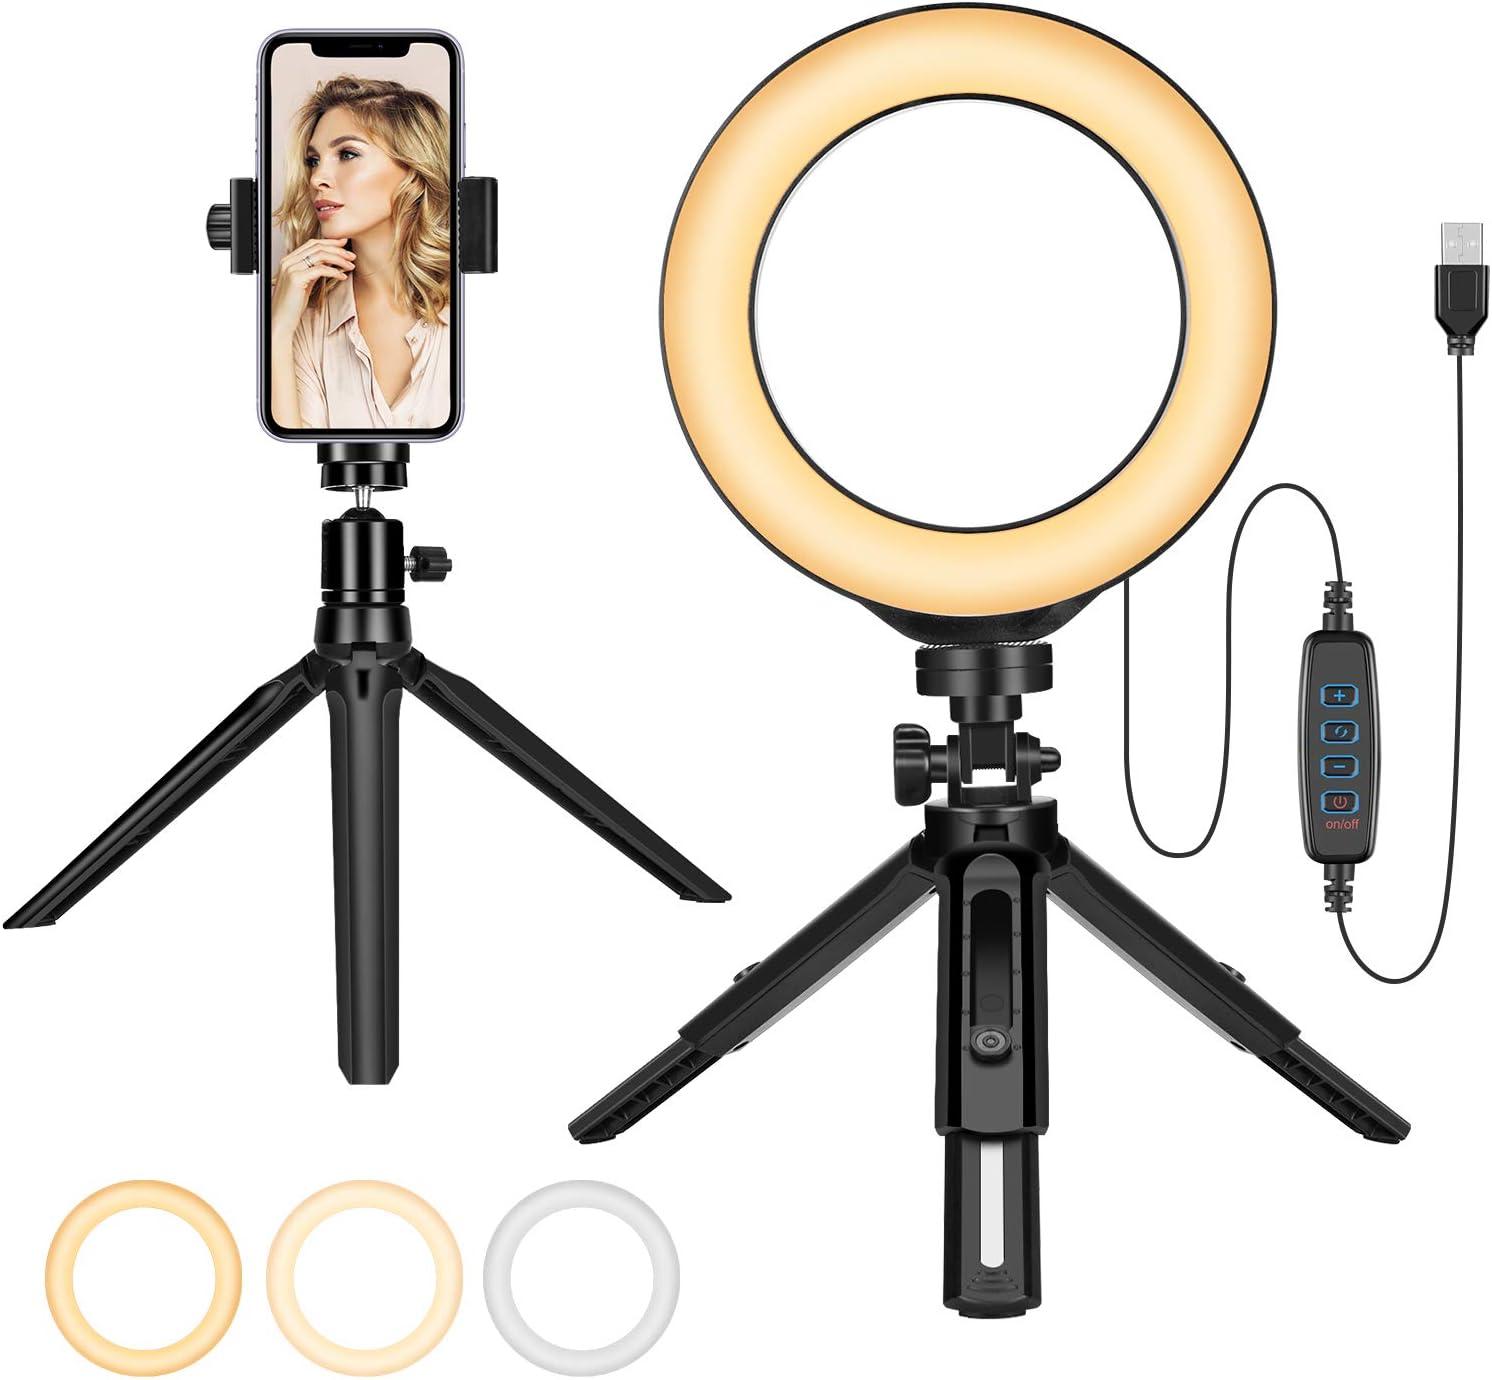 Make Up Ring Licht 6 Beauty Selfie Fotolicht Kit Mit Kamera